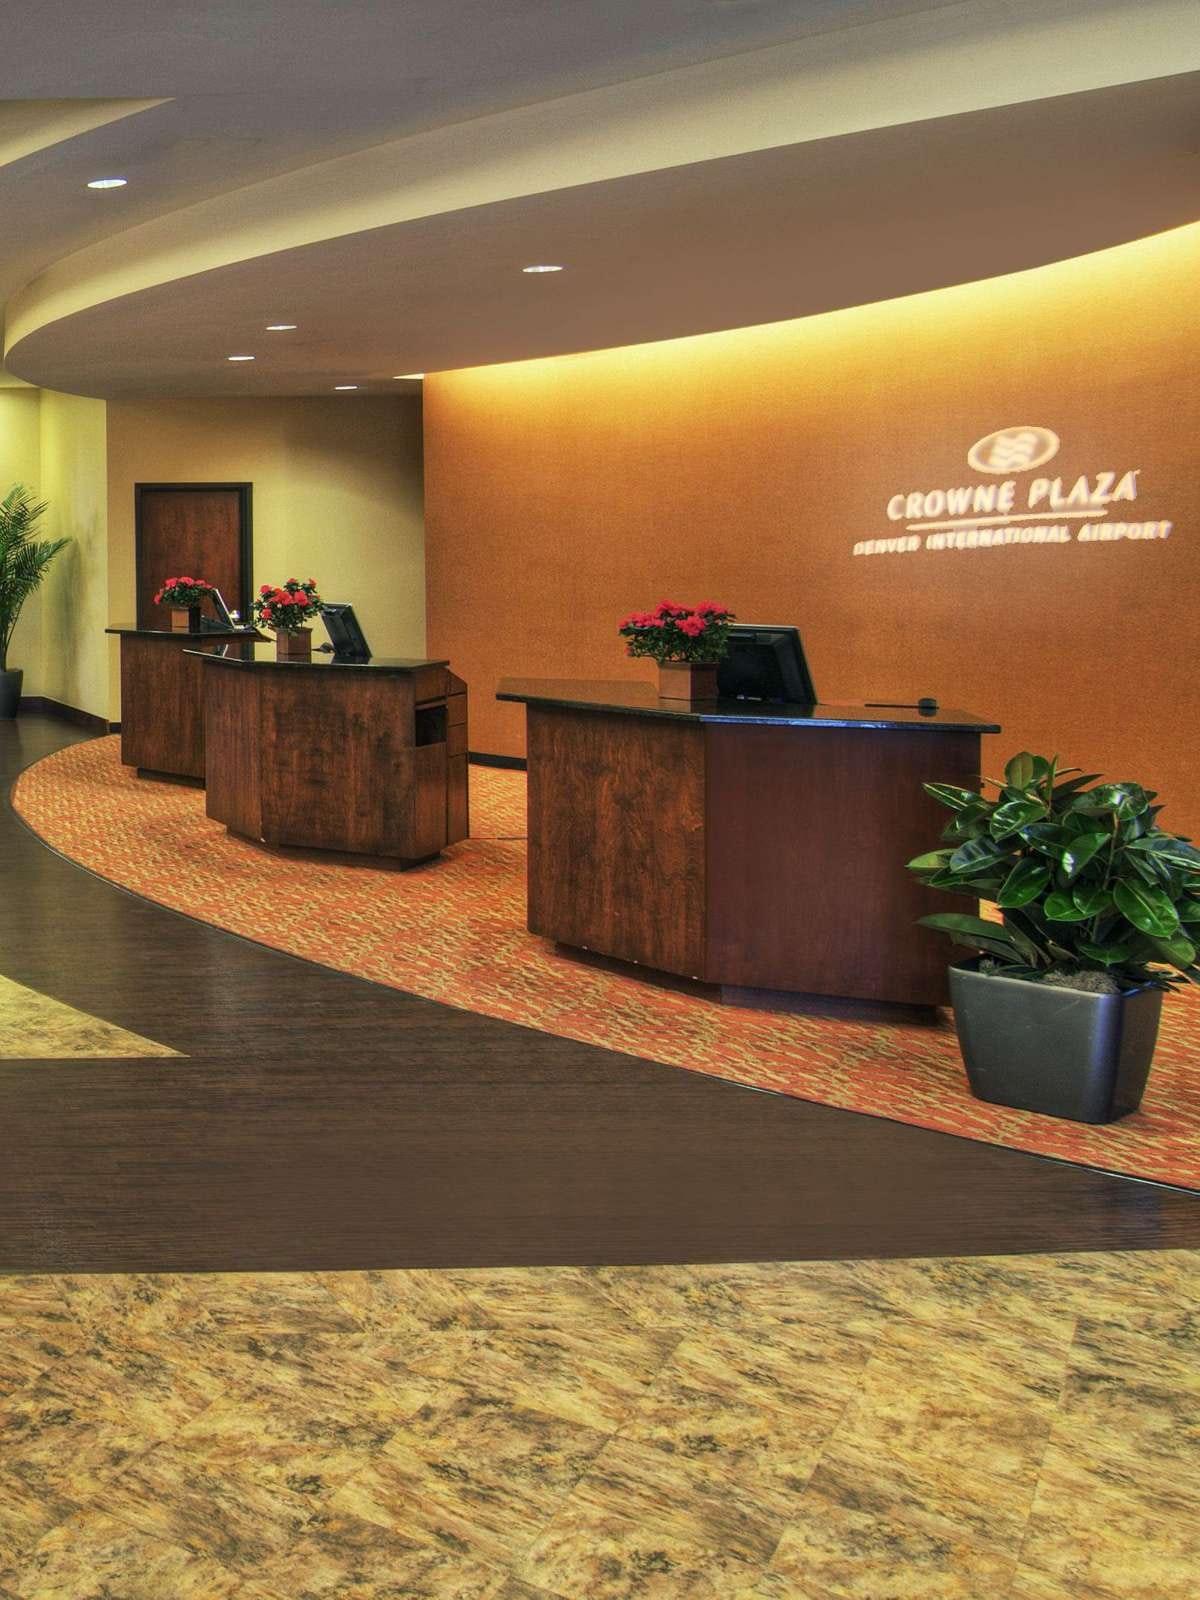 Crowne Plaza DENVER AIRPORT CONVENTION CTR